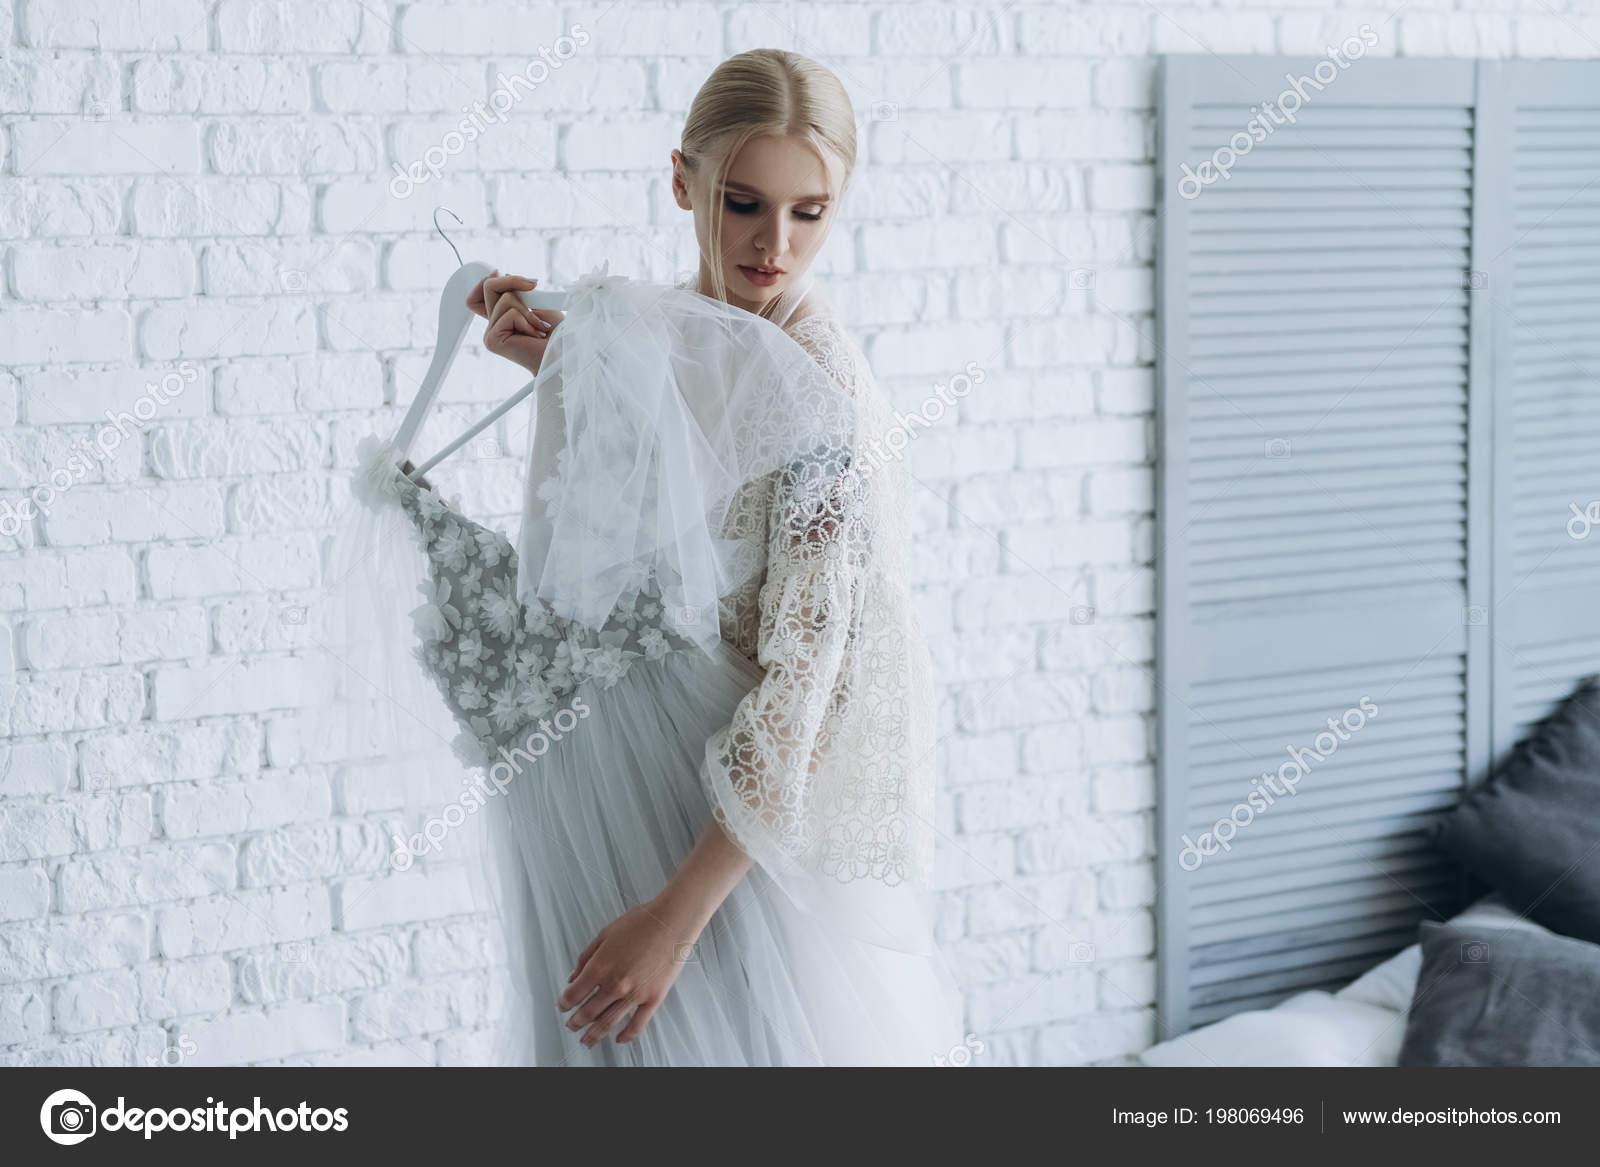 Beautiful Young Bride Wedding Dress Hanger Home — Stock Photo ...